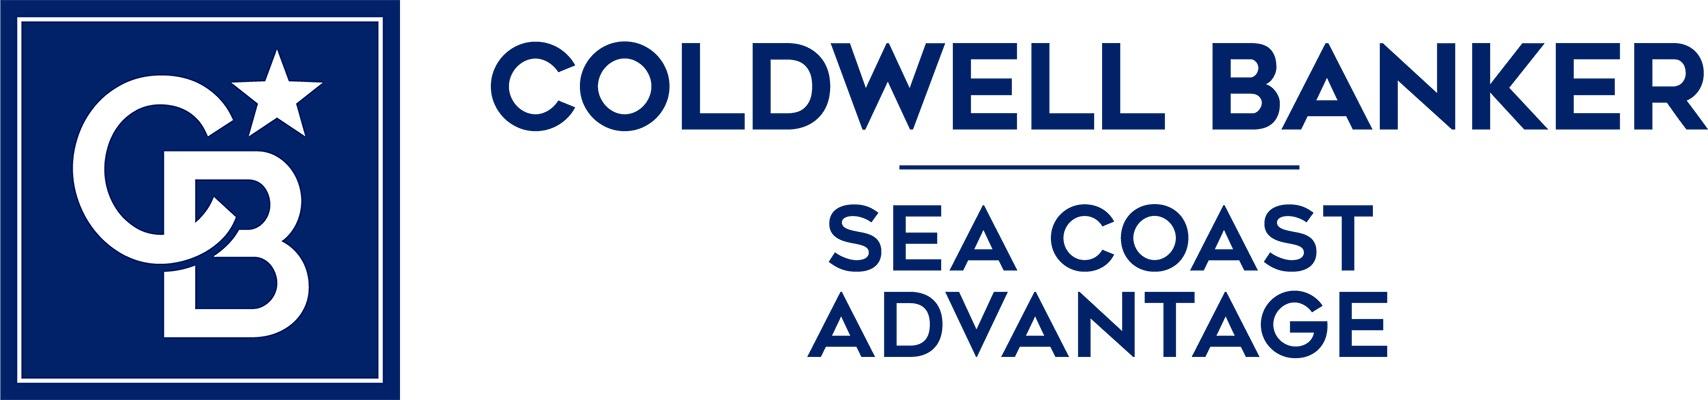 Catherine Lea - Coldwell Banker Sea Coast Advantage Realty Logo